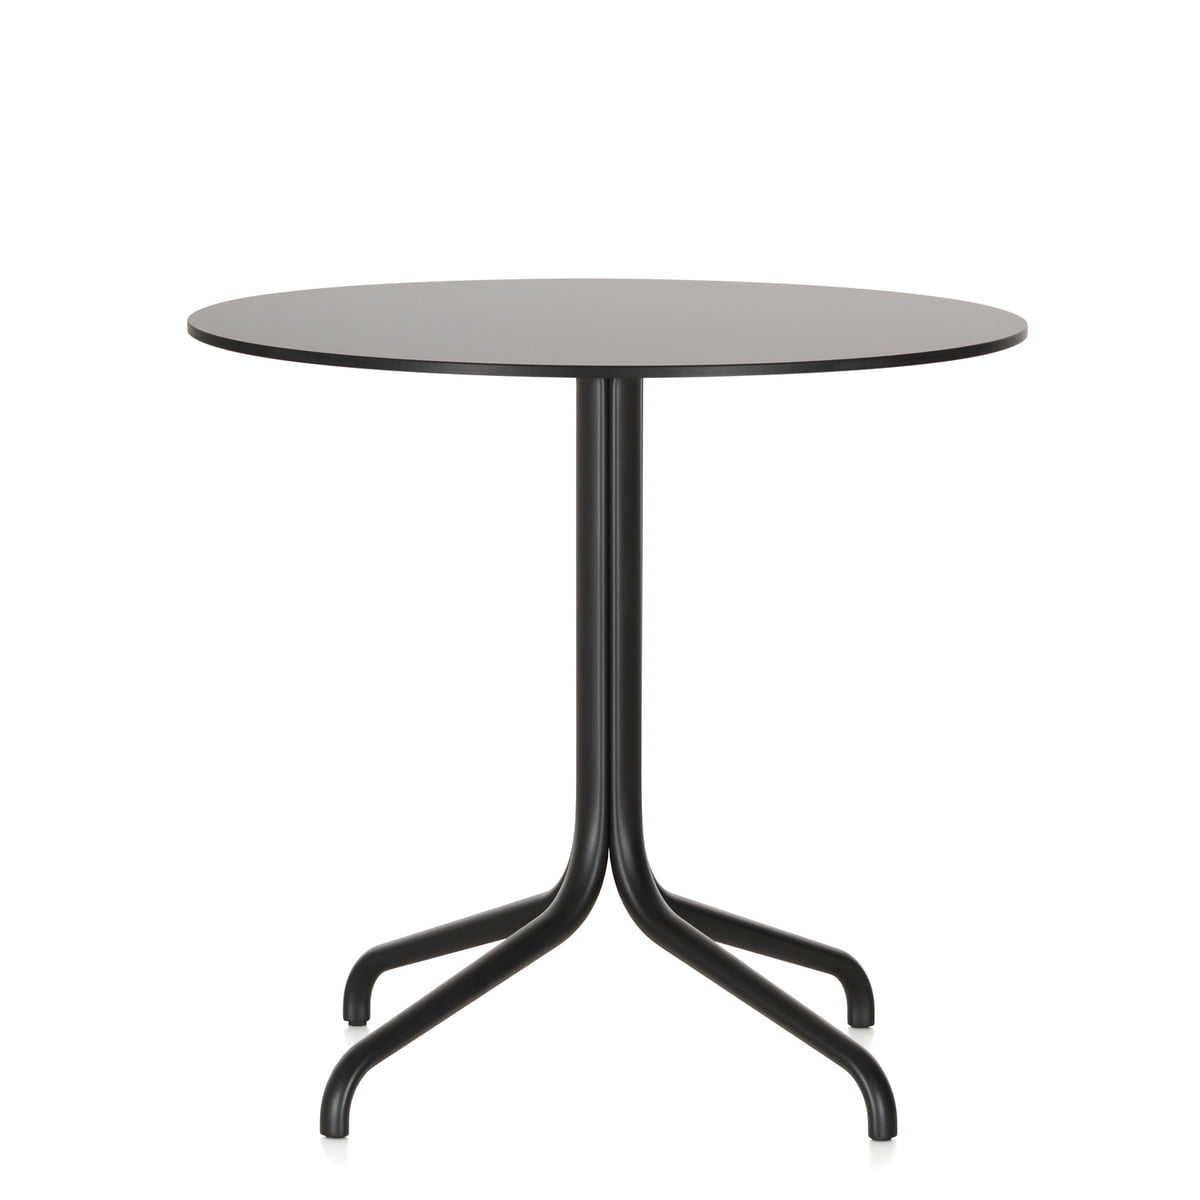 table d ext rieur ronde par vitra. Black Bedroom Furniture Sets. Home Design Ideas